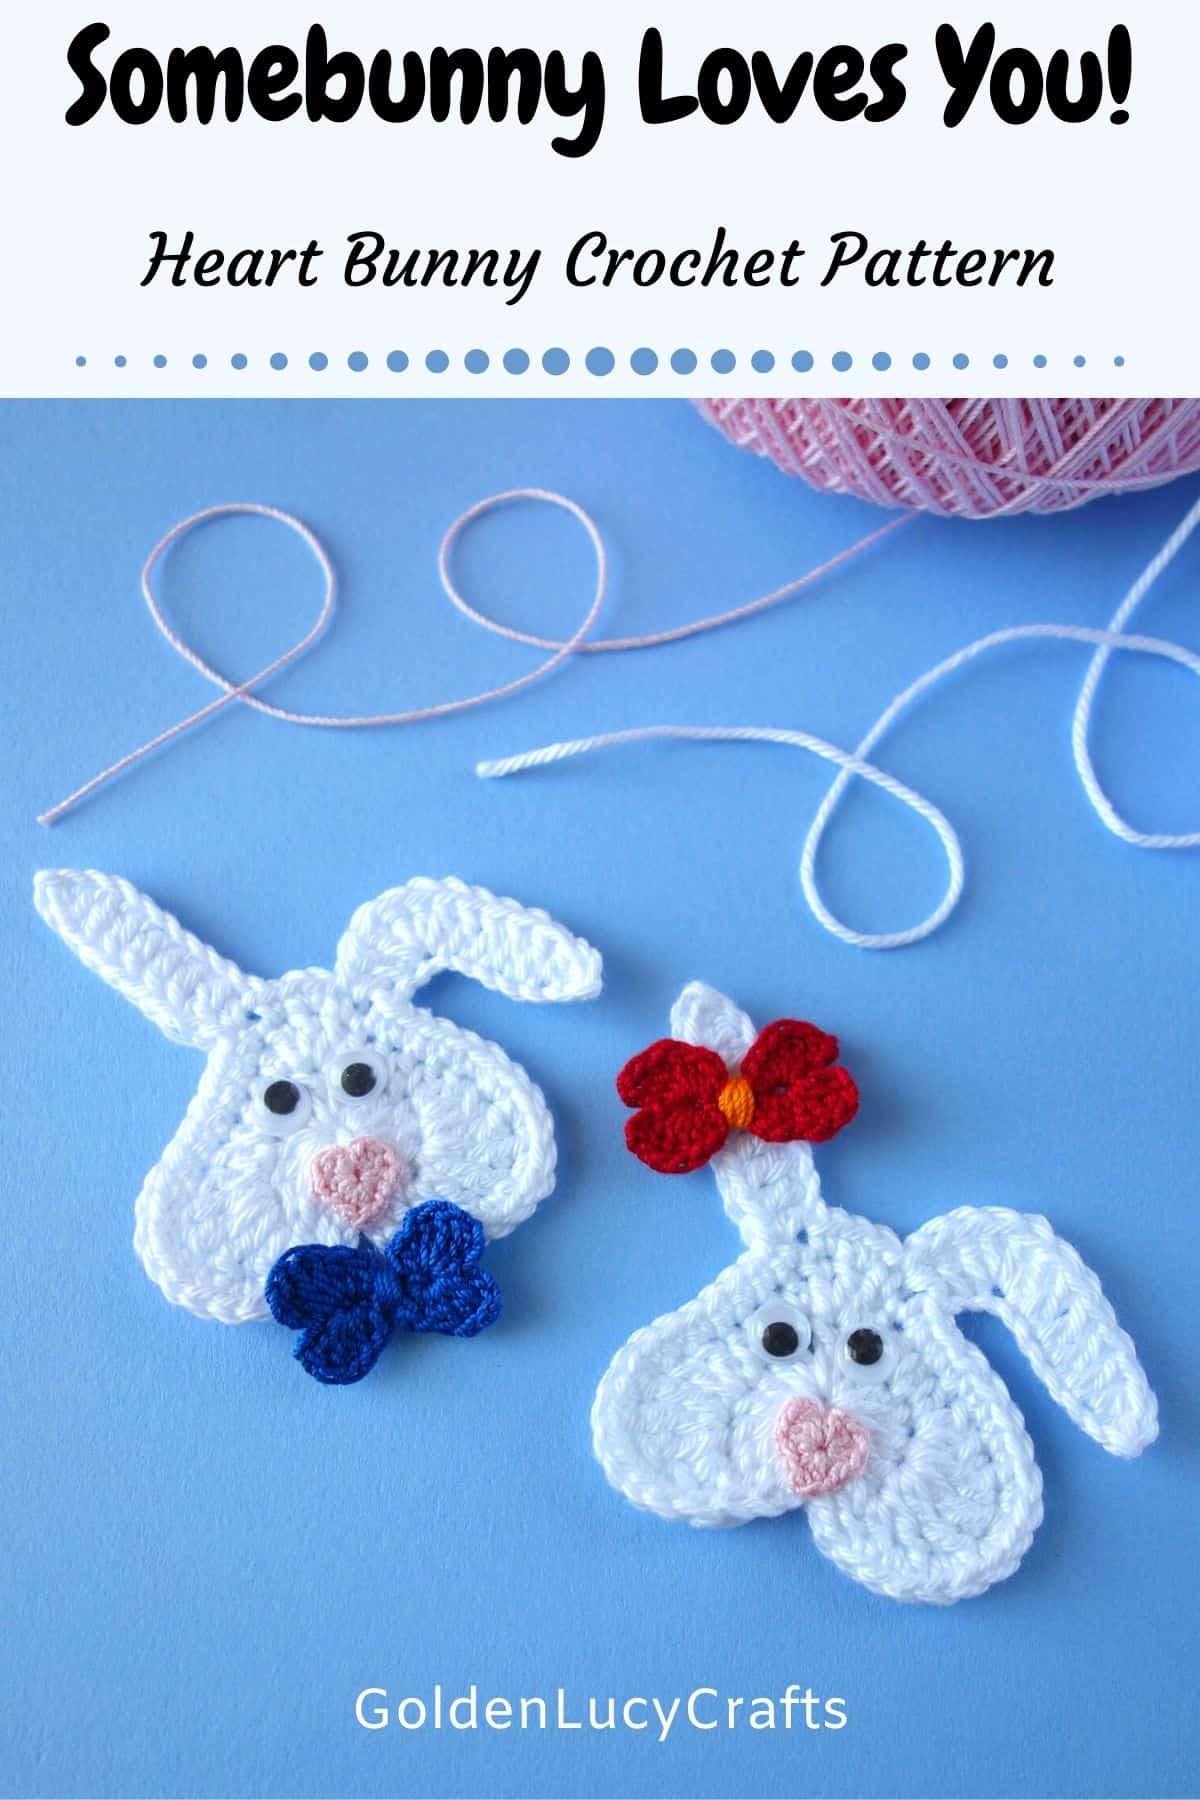 Two crochet heart-shaped bunnies, text saying Somebunny loves you! Heart Bunny crochet pattern.